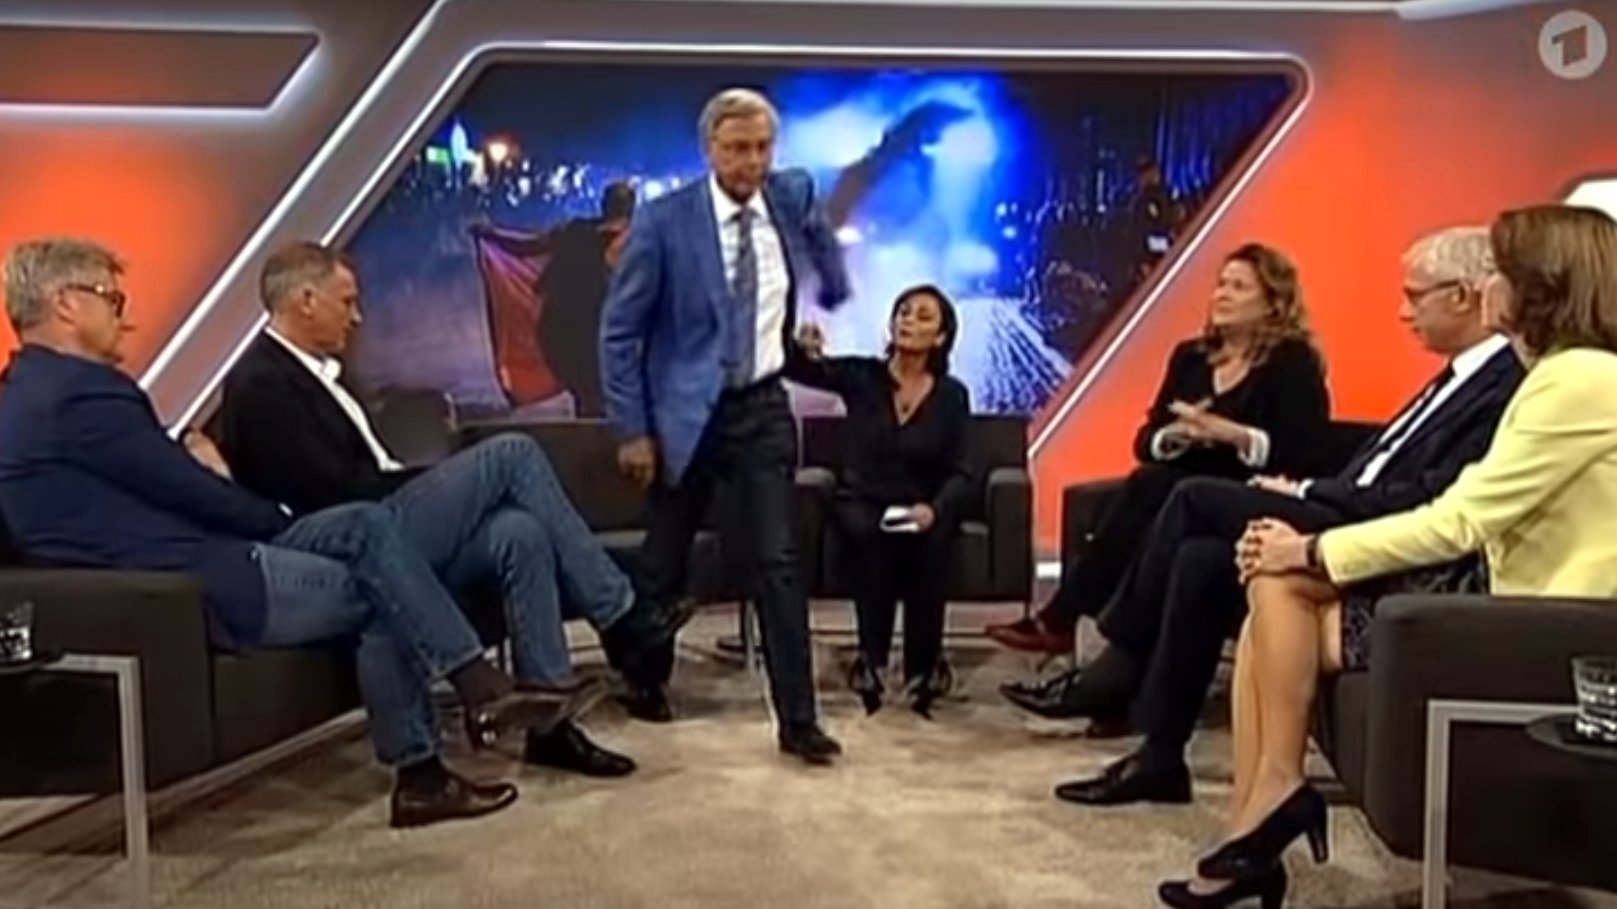 Eklat bei Maischberger: Bosbach verlässt die Sendung